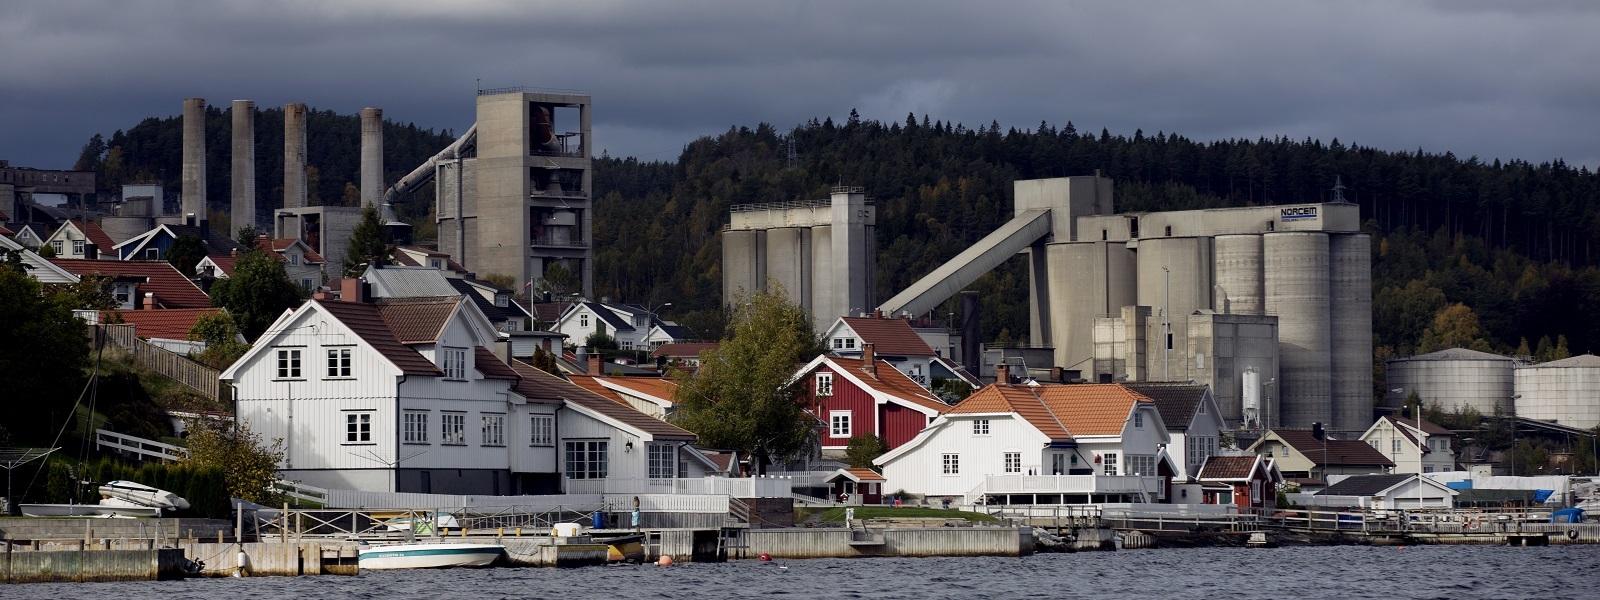 Cement Factory in Norway